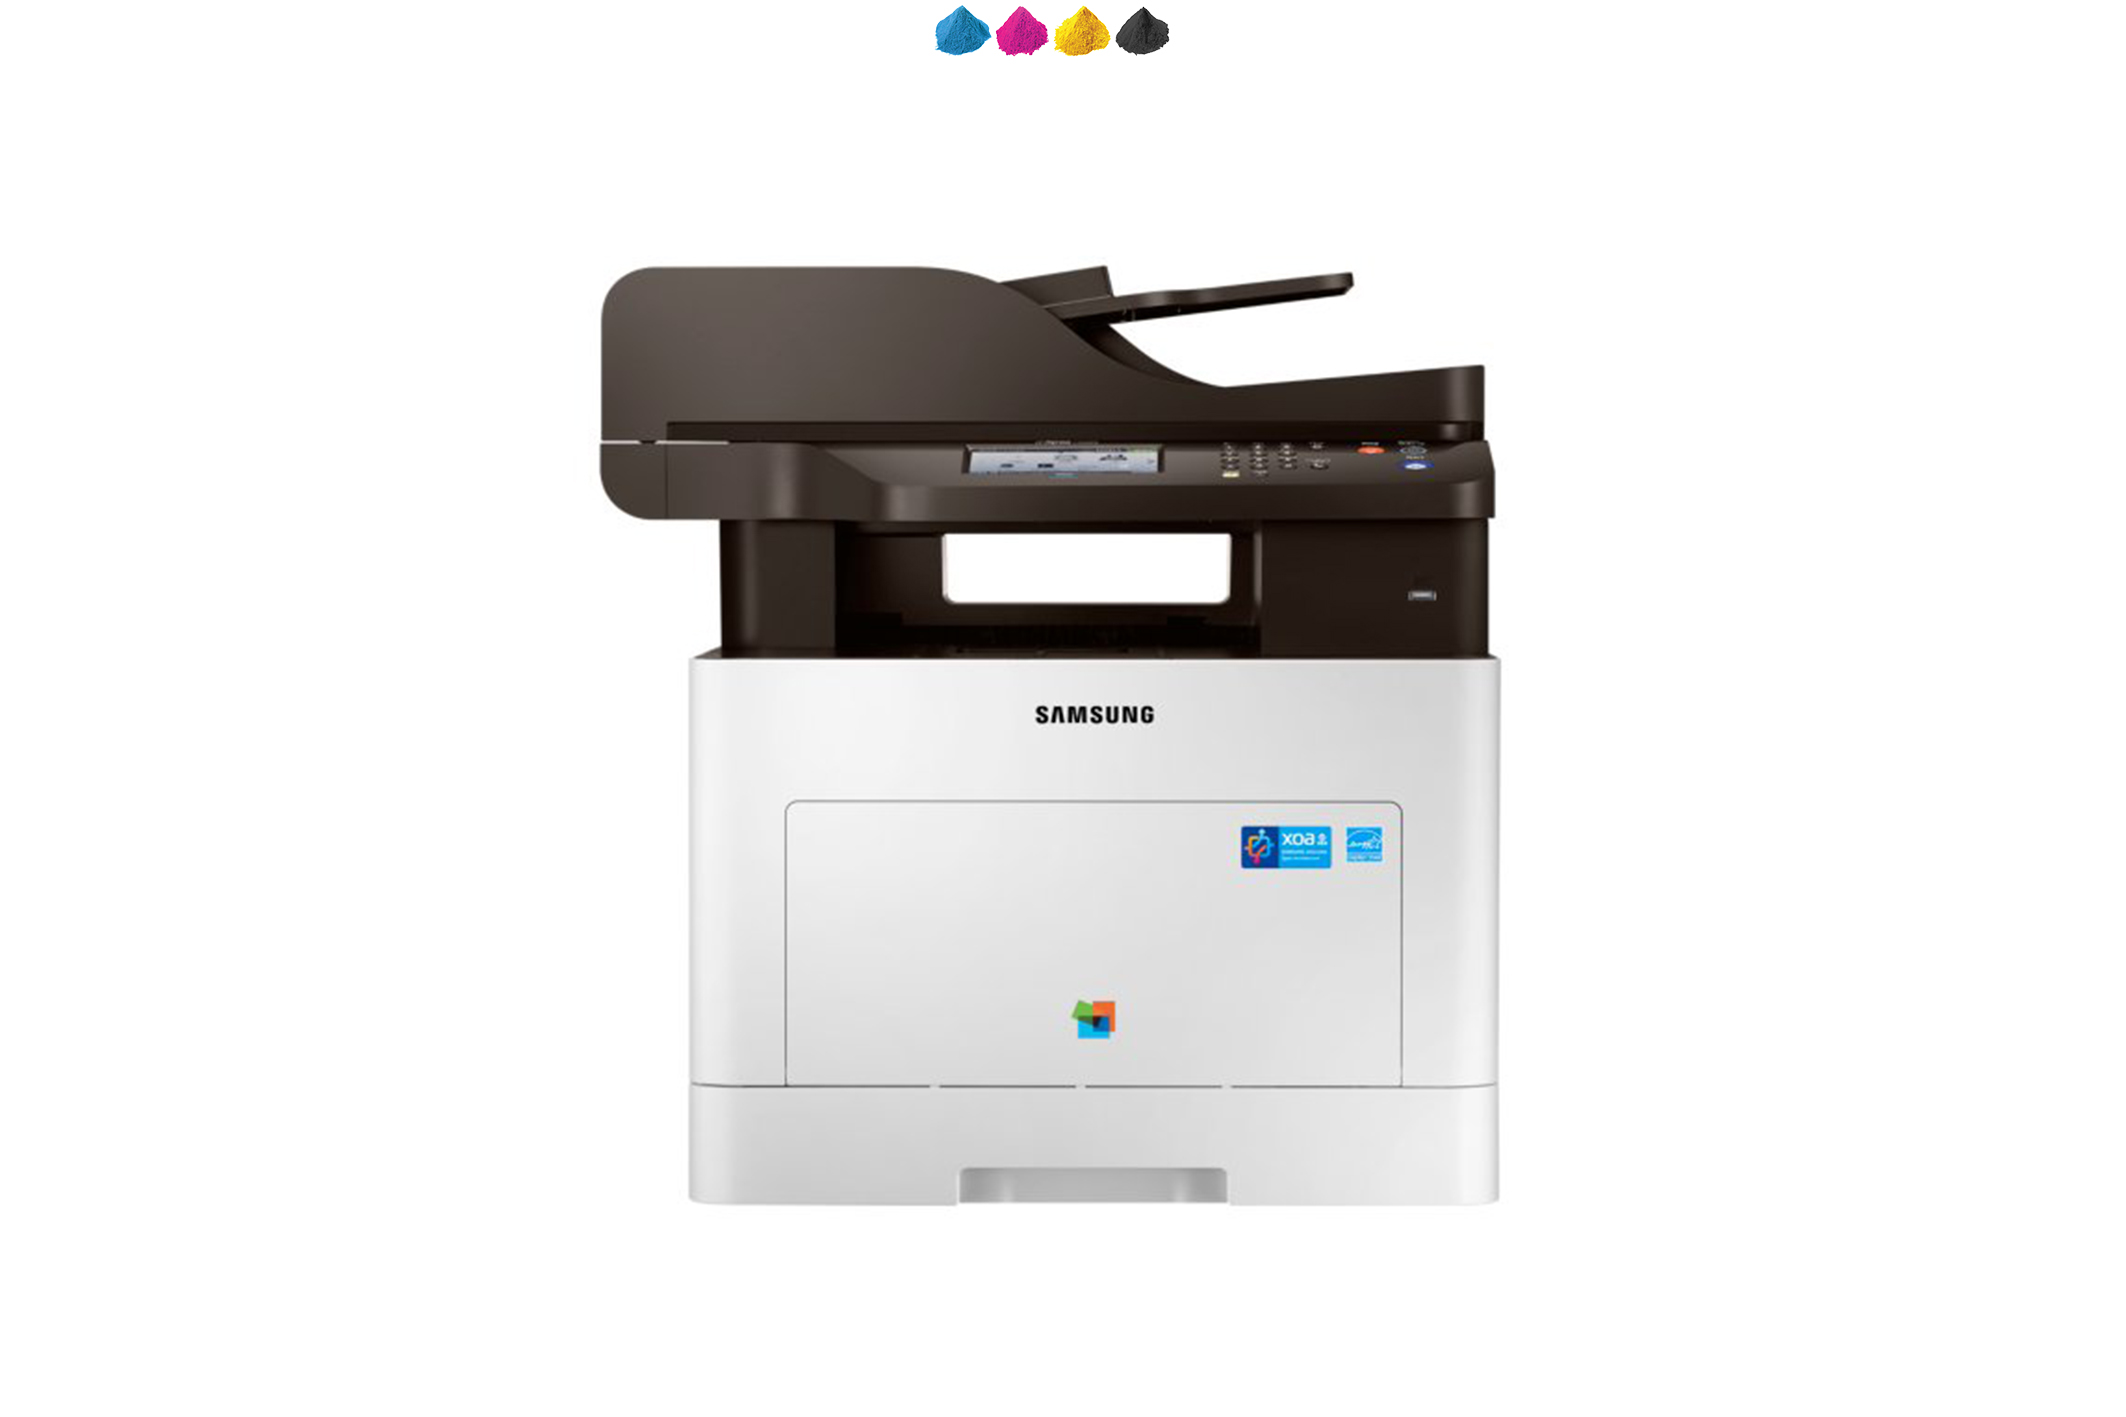 Samsung C3060frcolour